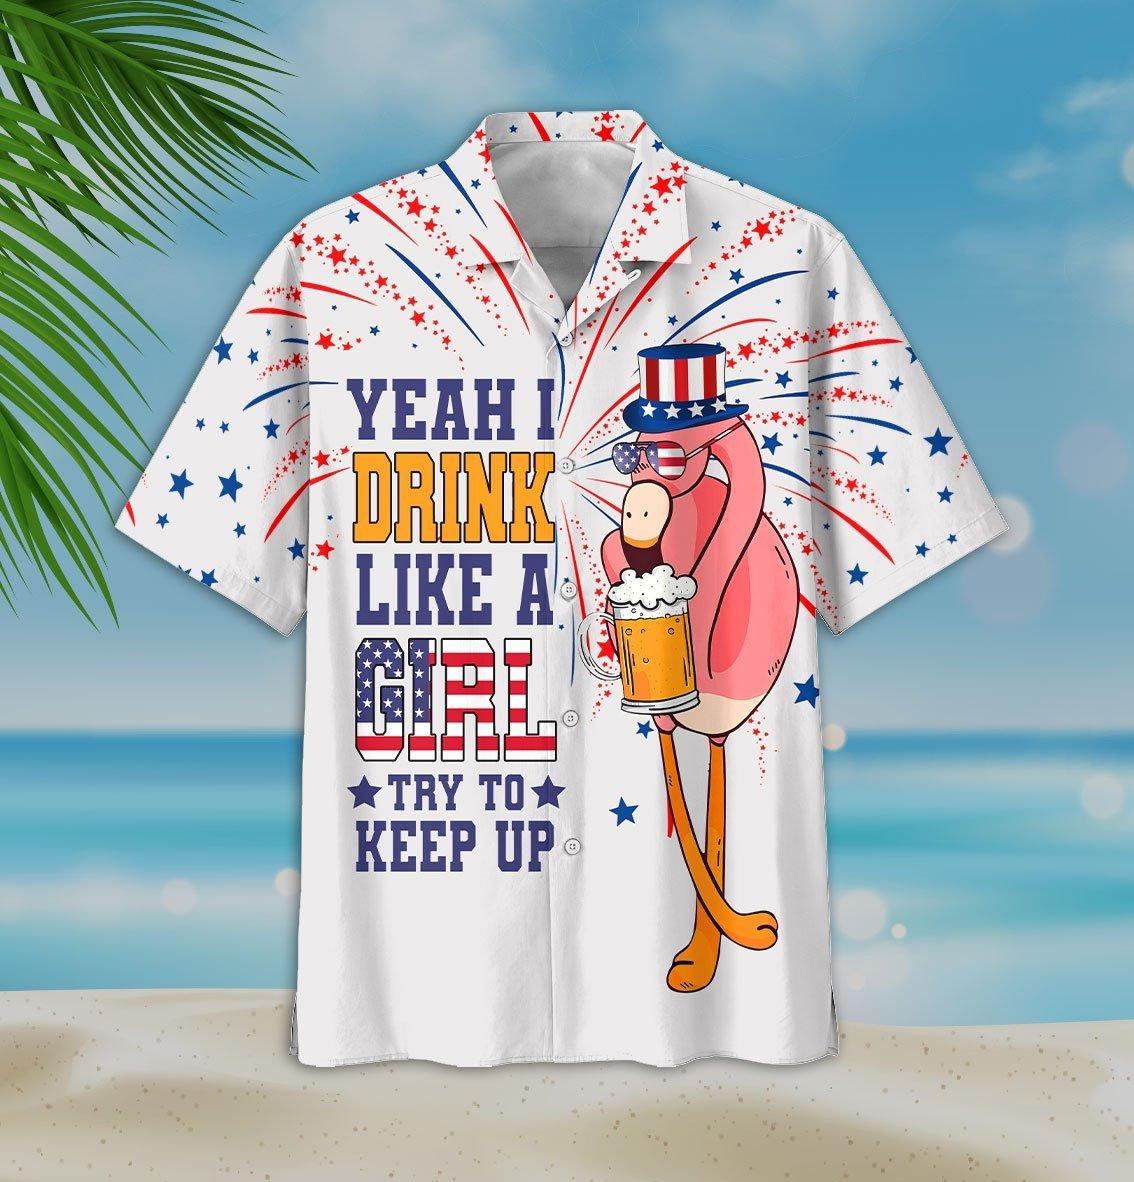 Flamingo And Beer Yeah I Drink Like A Girl Try To Keep Up Hawaiian Shirt2